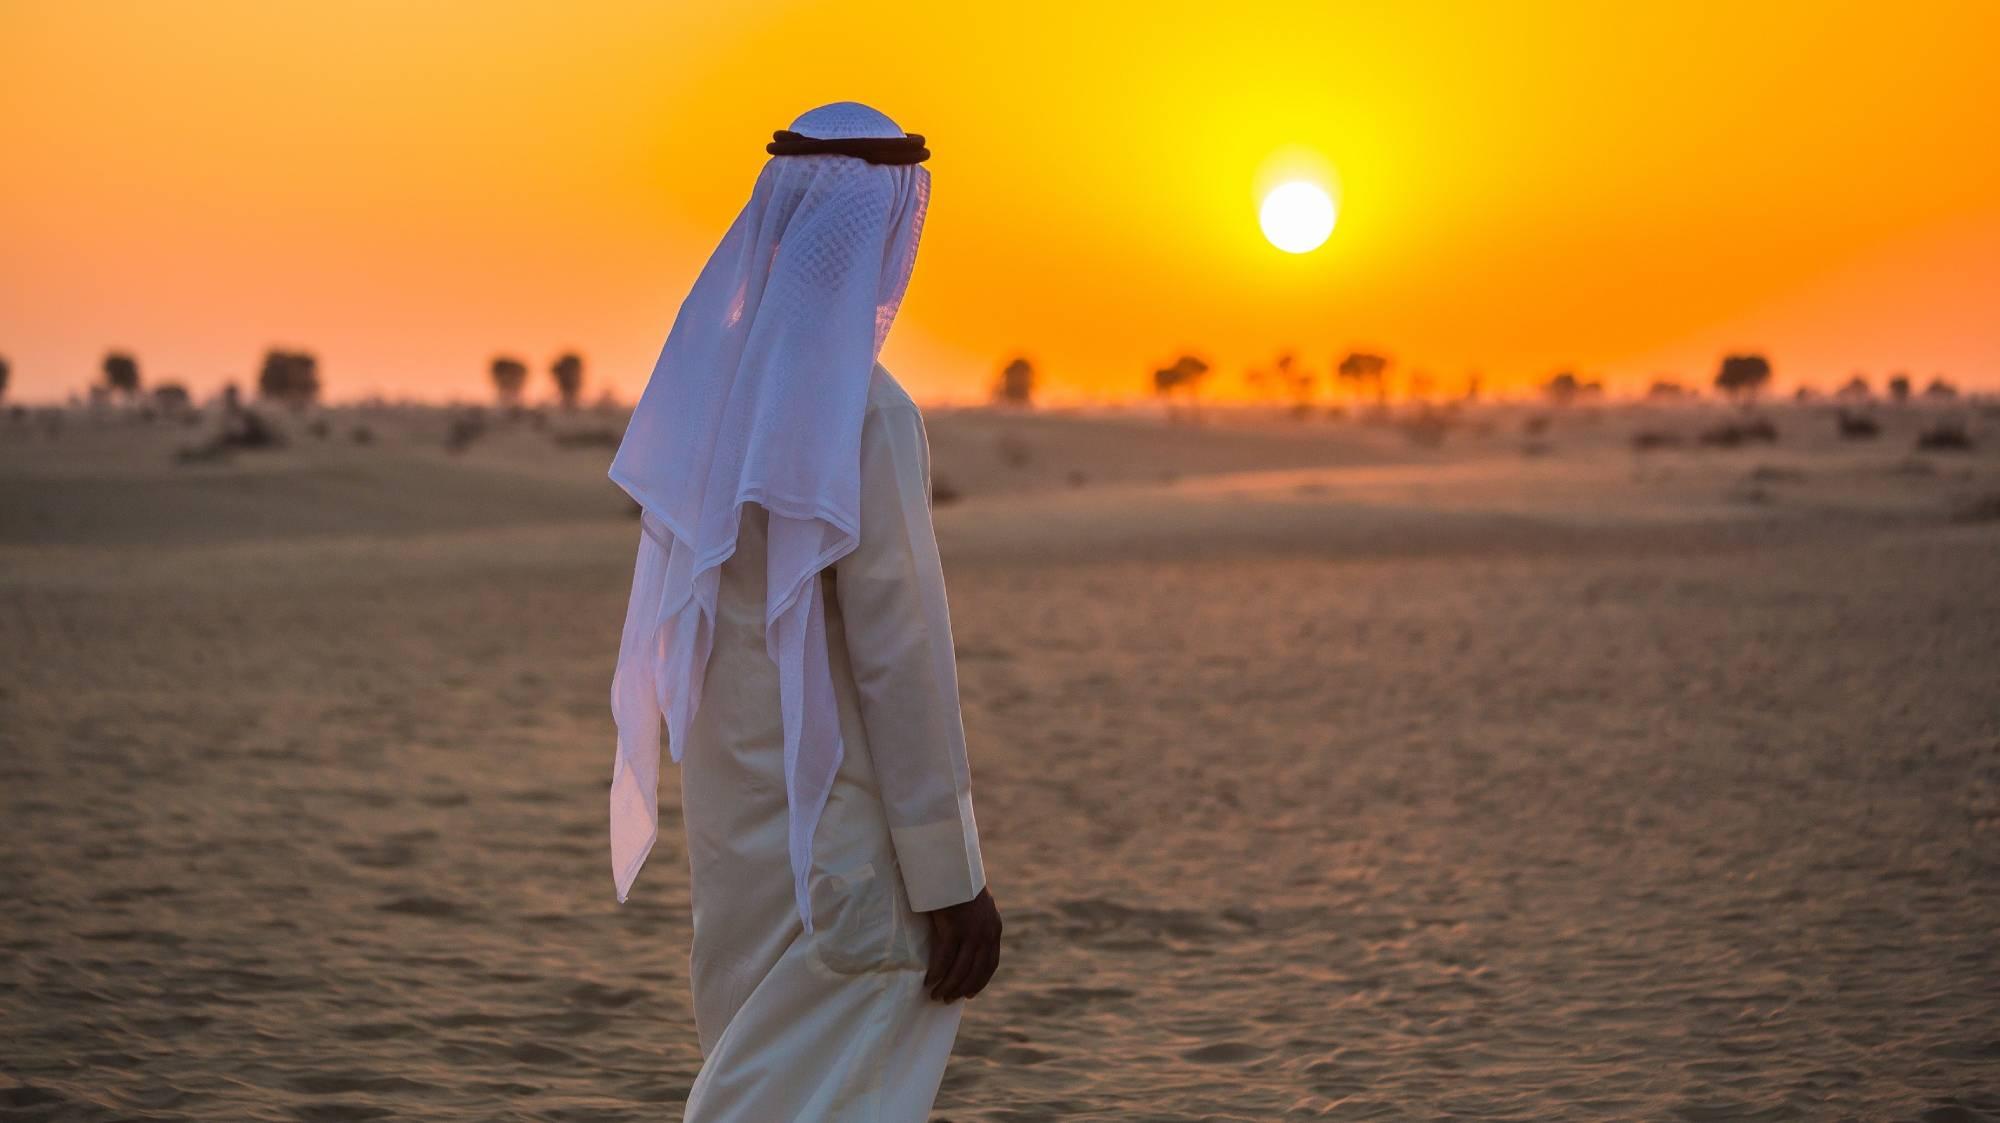 Middle East - Travel Blog